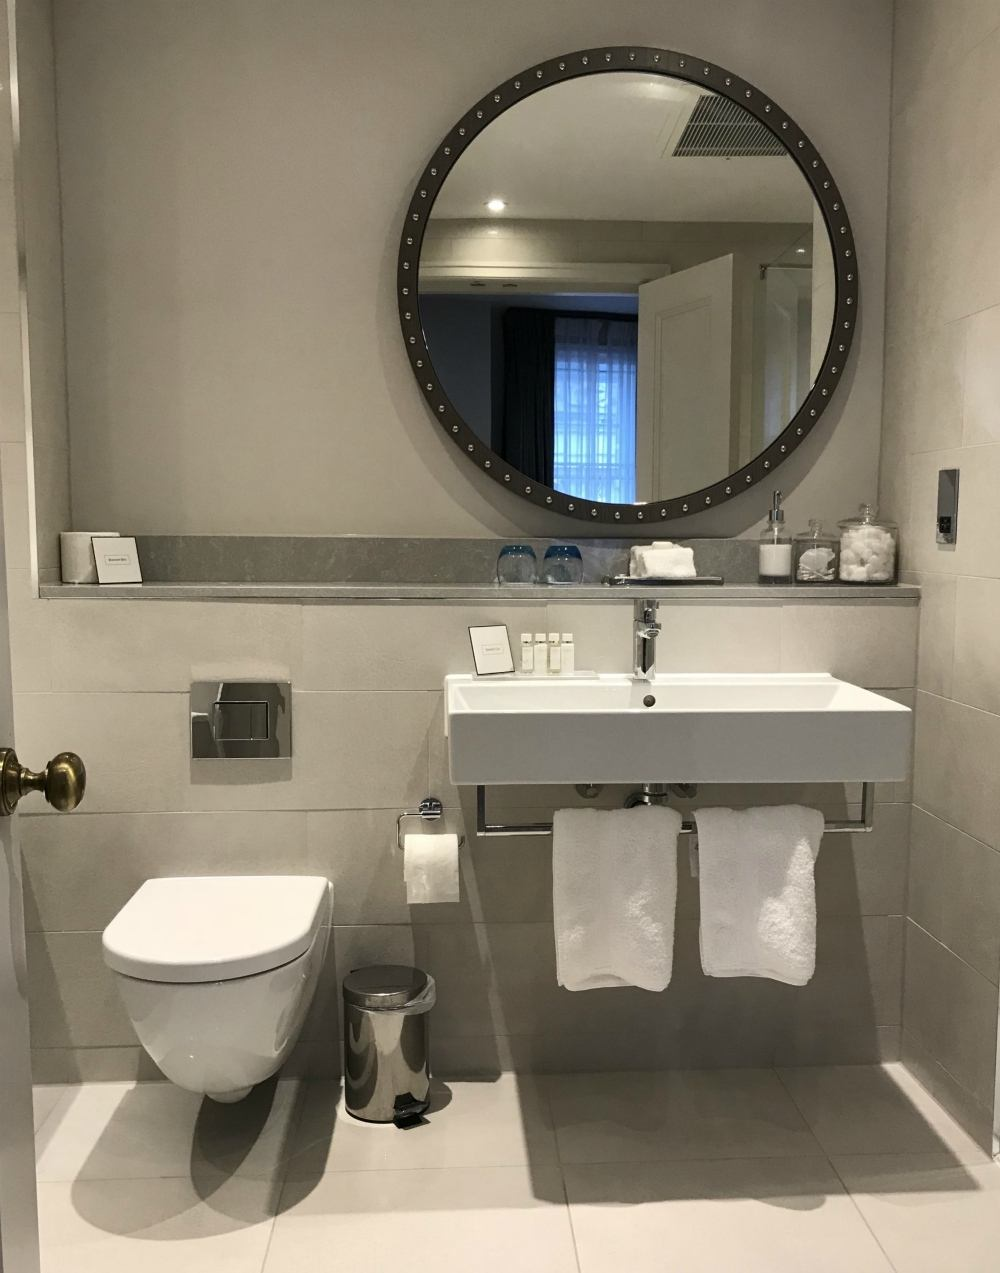 Bathroom at Harbour Hotel Bristol Heatheronhertravels.com